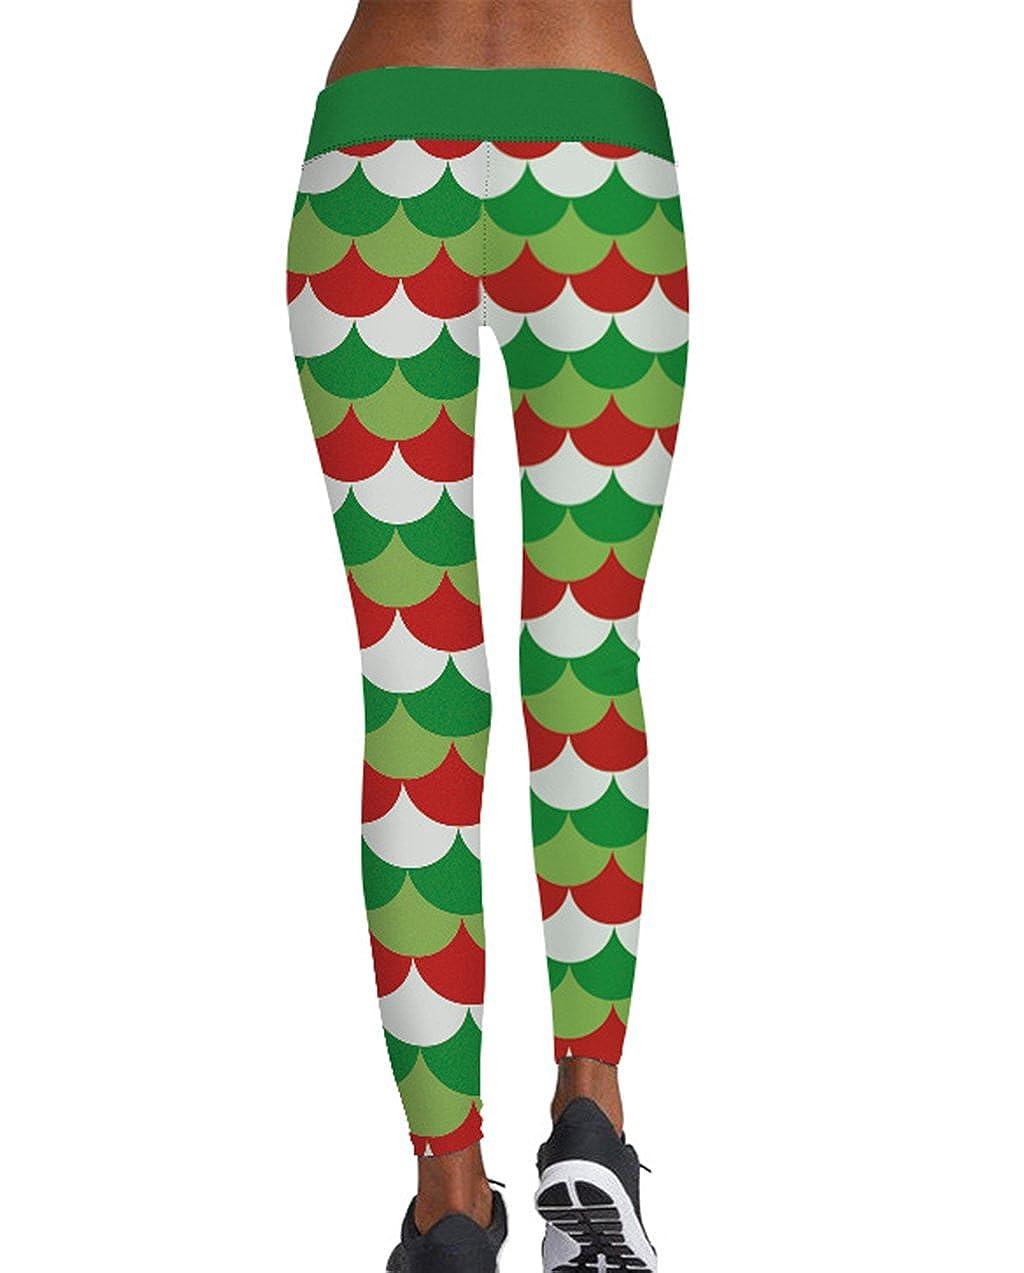 GUOLEZEEV Christmas Costume Novelty Leggings Stretch Yoga Tights Skinny Pants for Women